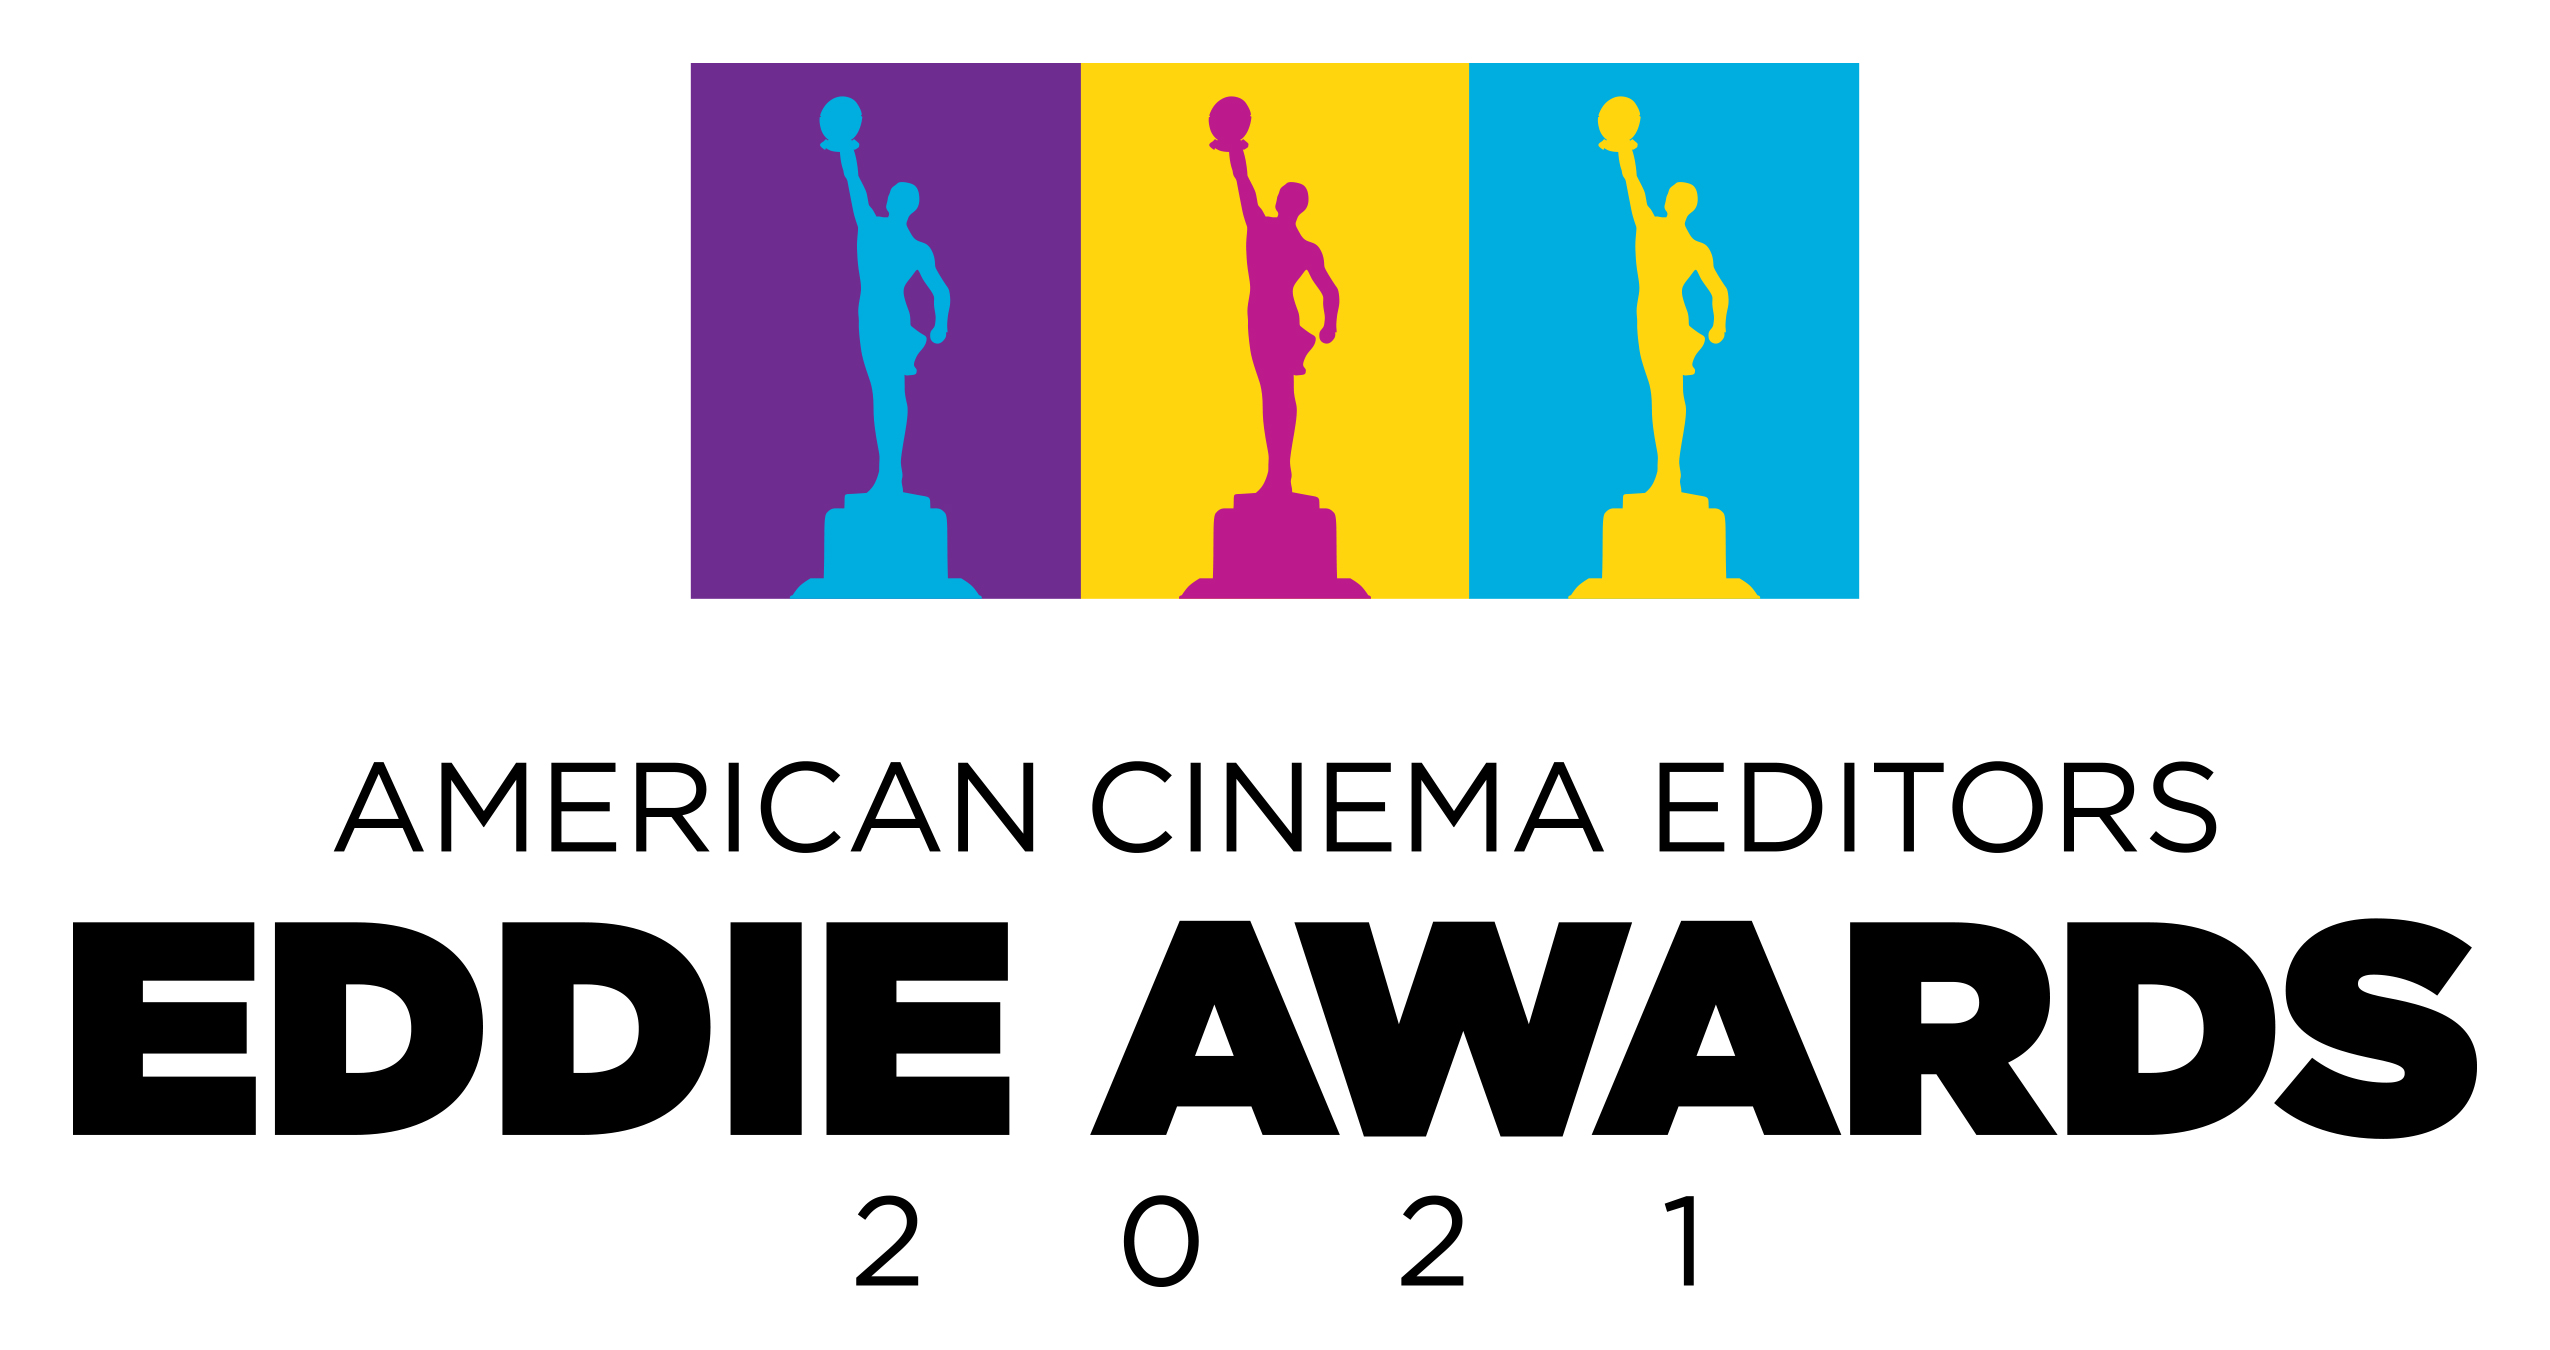 American Cinema Editors 2021 EDDIE AWARDS